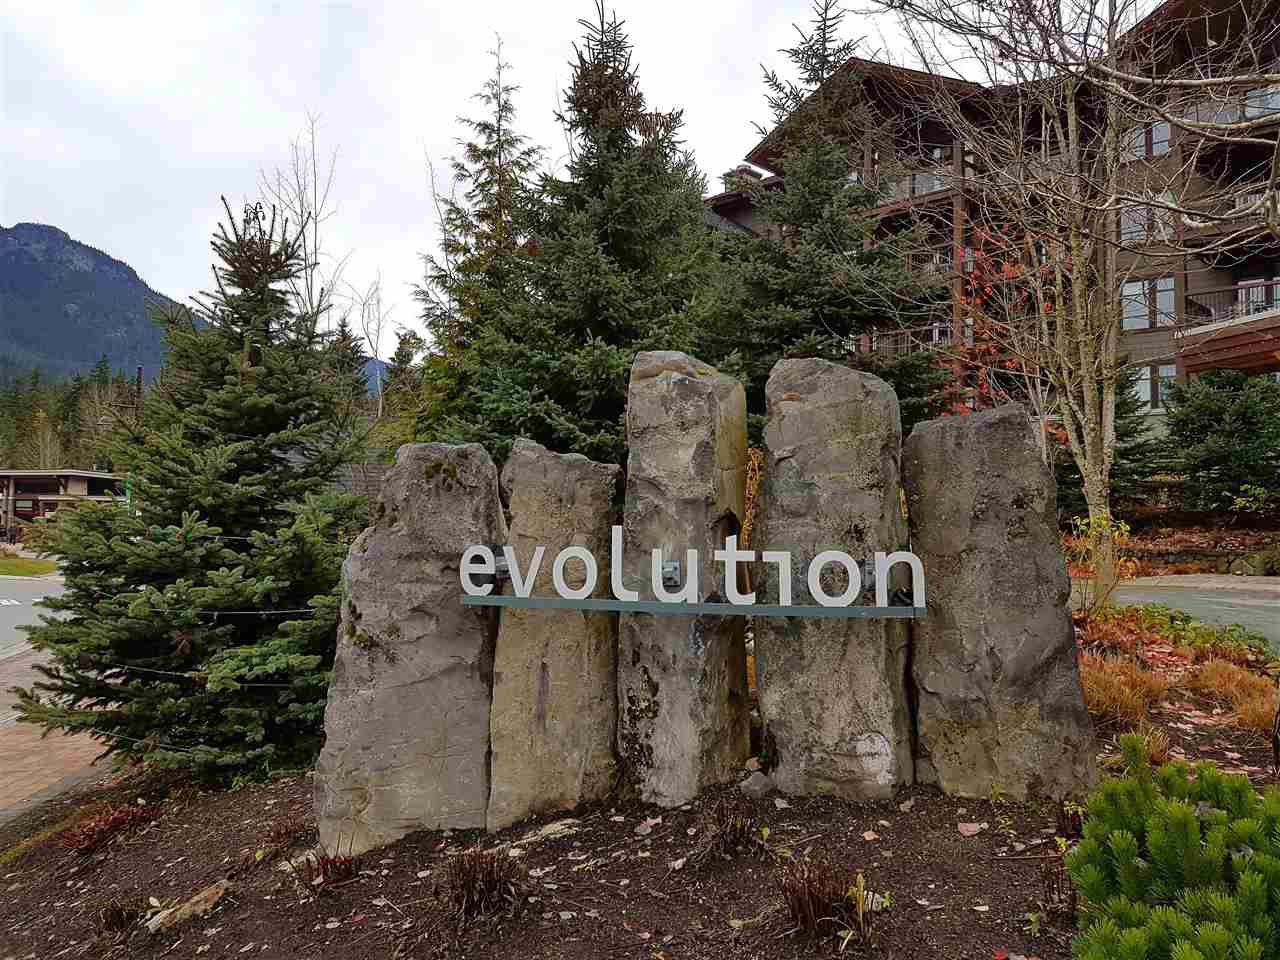 "Main Photo: 413b 2020 LONDON Lane in Whistler: Whistler Creek Condo for sale in ""Evolution"" : MLS®# R2122024"